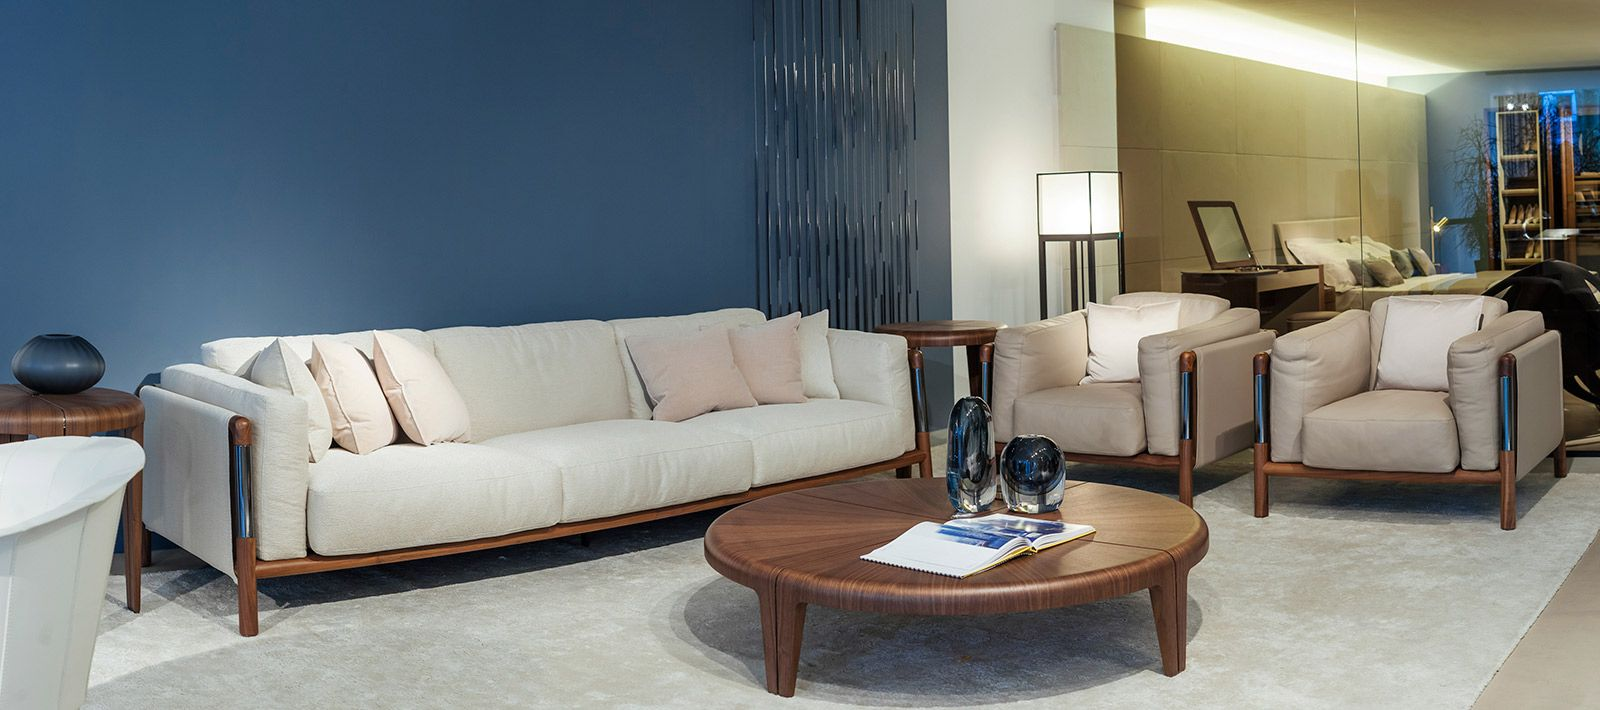 Eventi e News Home decor, Furniture, Seating